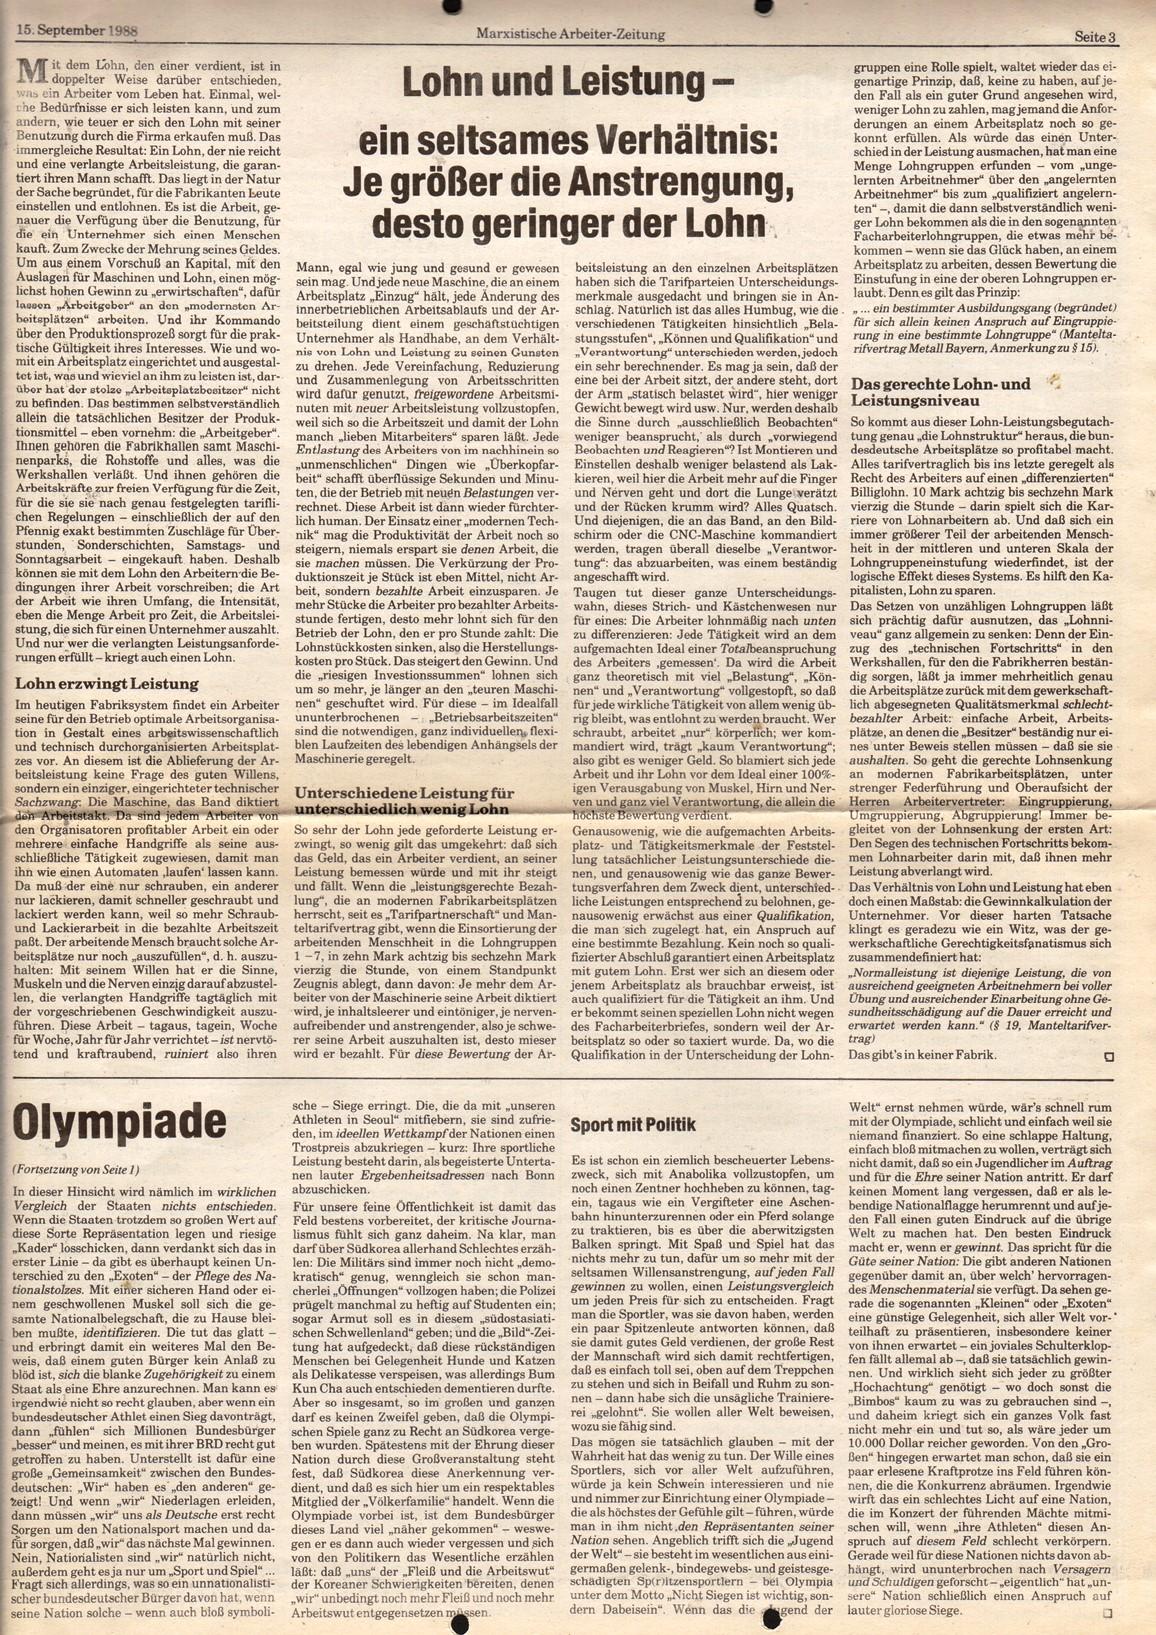 Muenchen_MG_MAZ_19880915_03